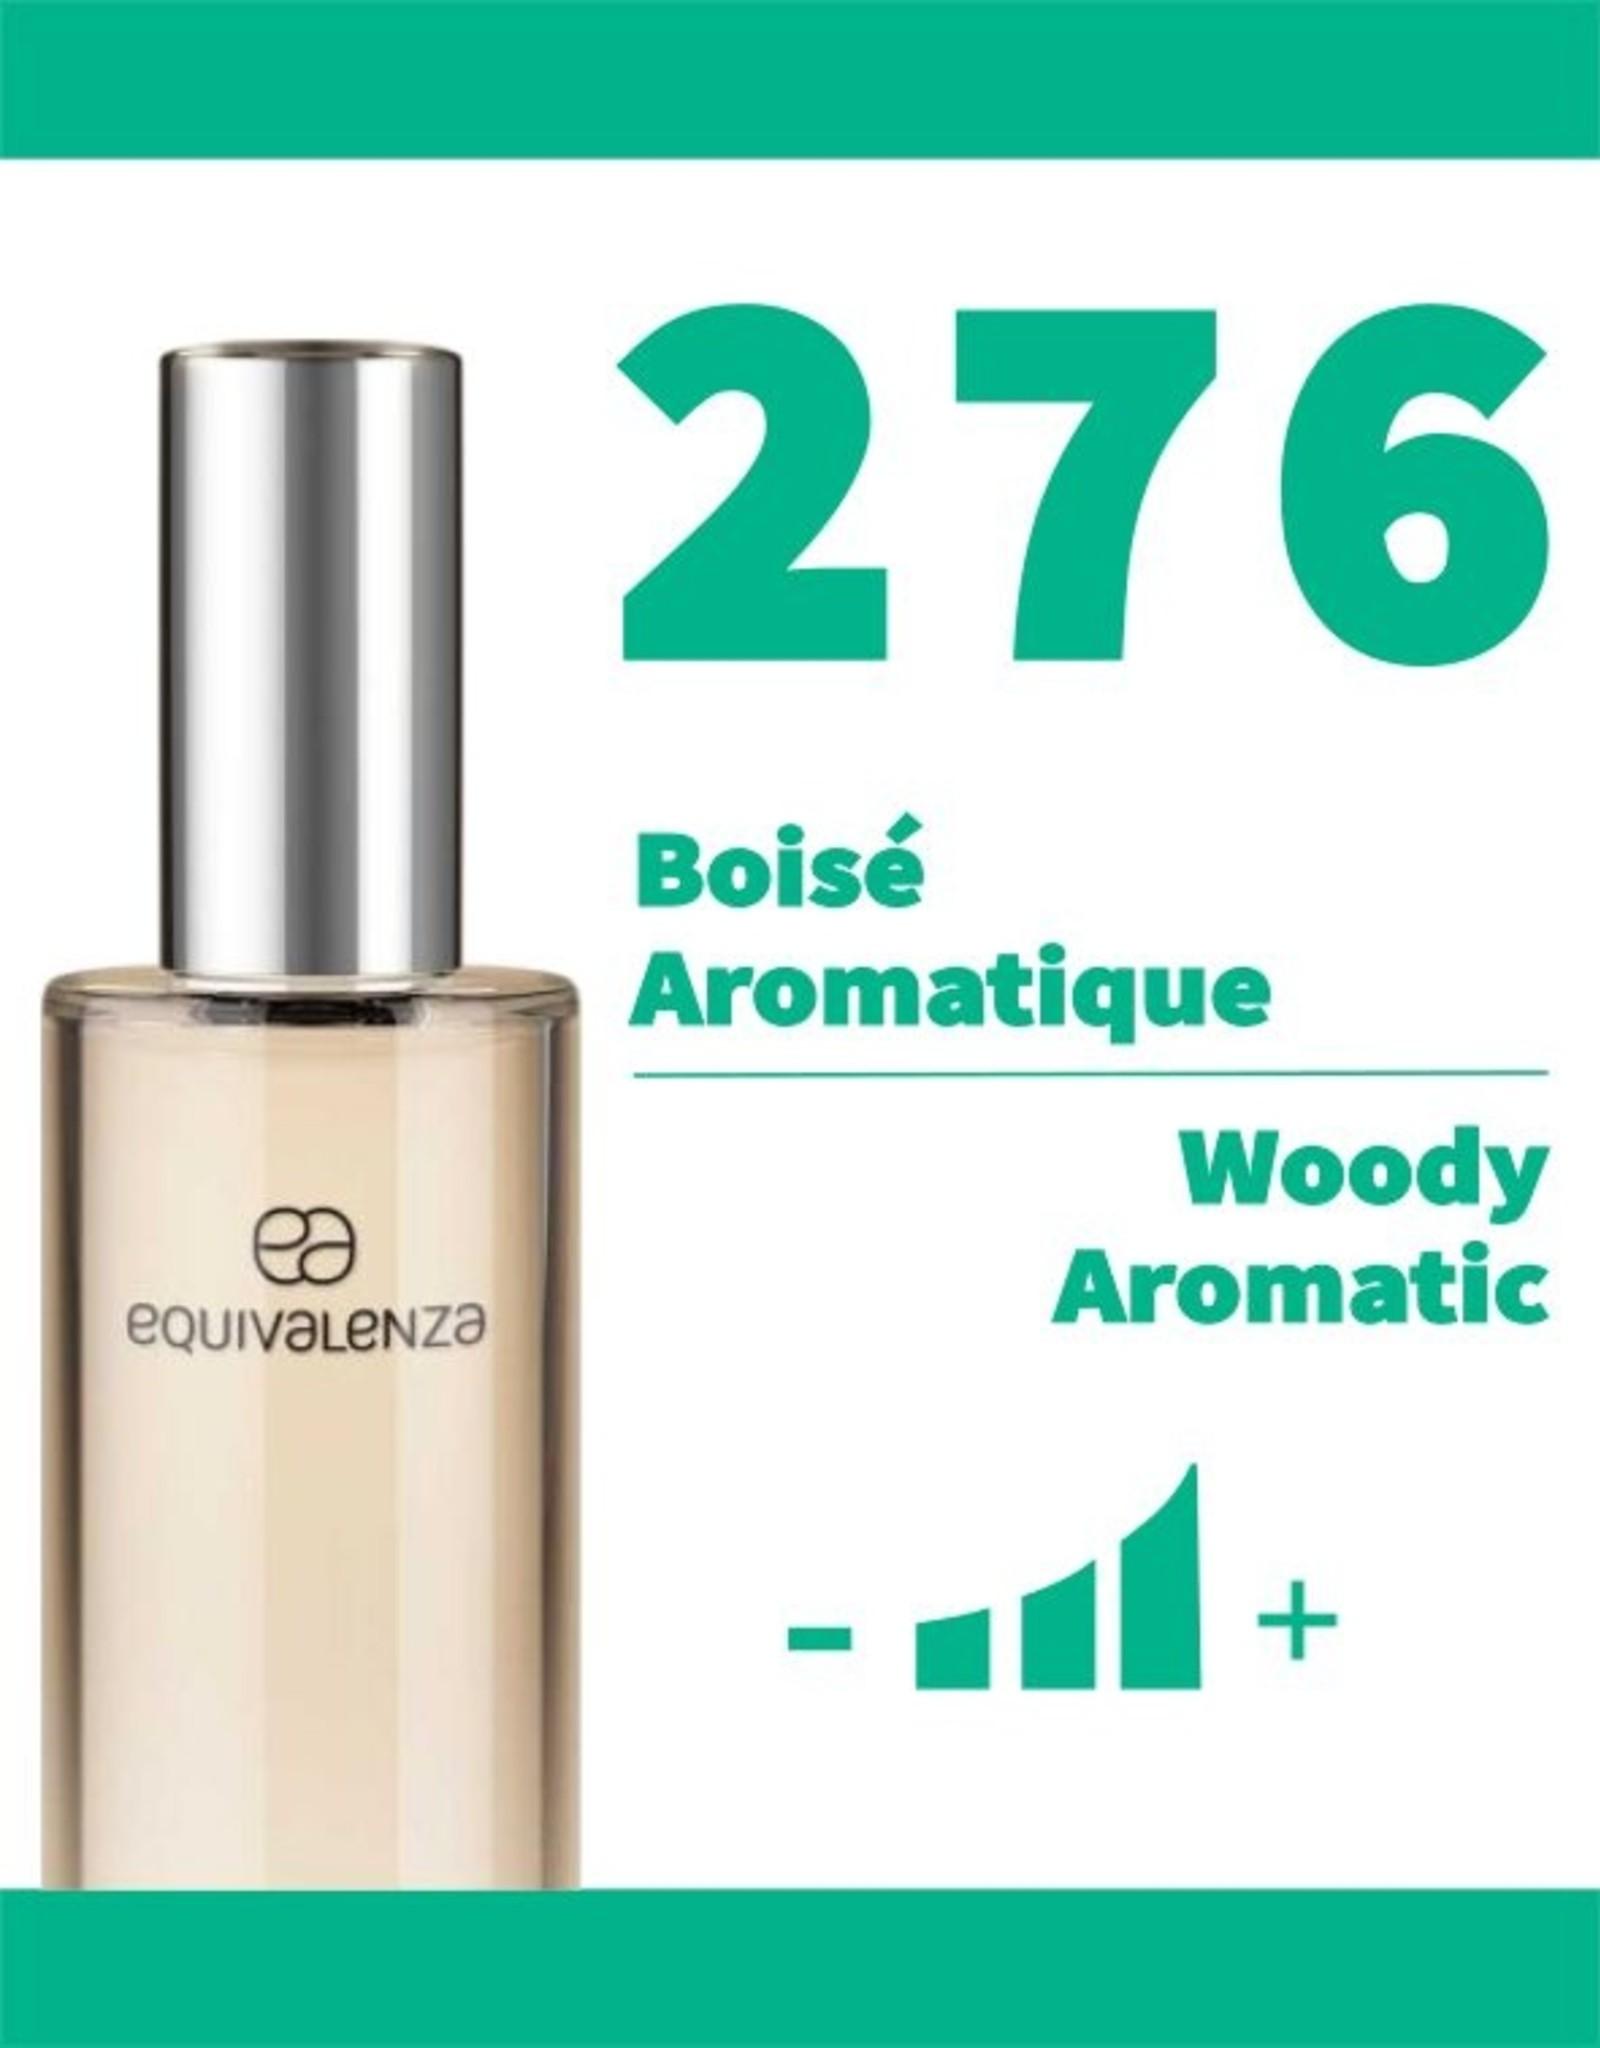 Equivalenza Eau de Toilette Woody Aromatic 276